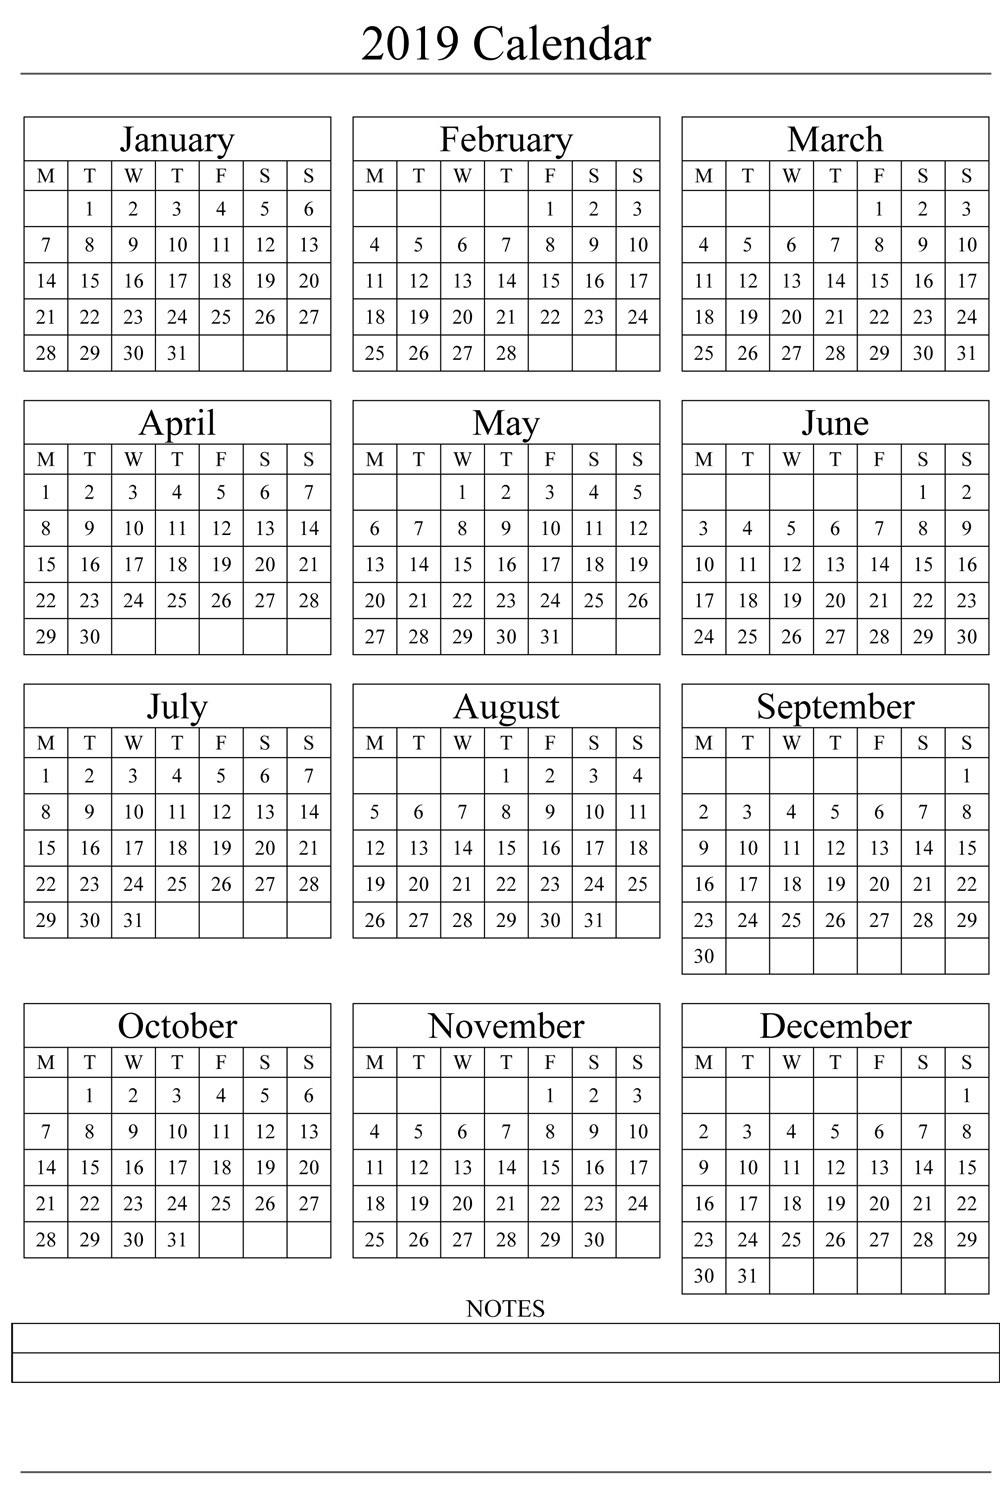 2019 Printable Calendar Templates - Blank Word Pdf - Calendar End in Calendar With Holidays Printable Templates